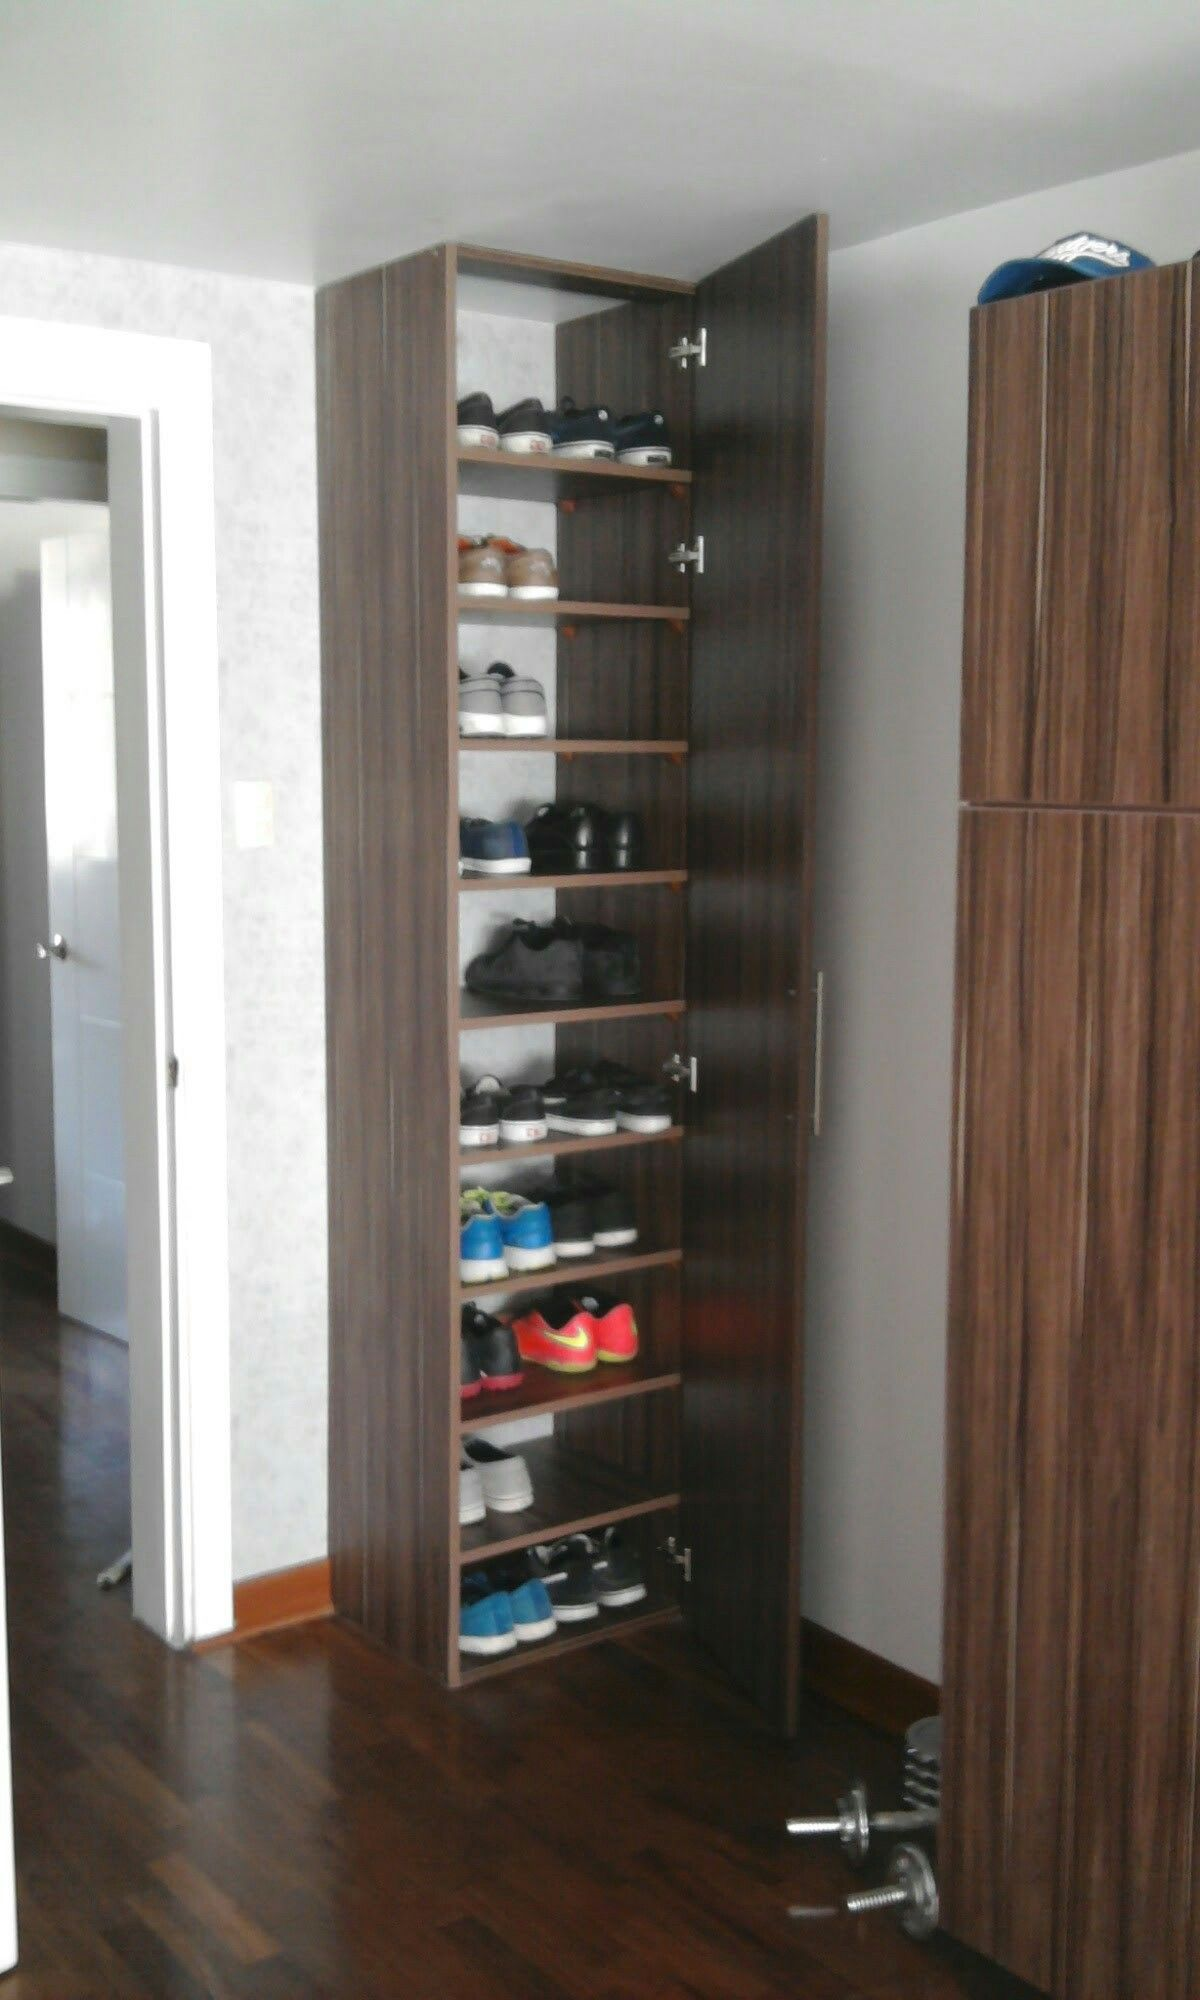 Zapatera repisas in 2019 mueble zapatero zapateras de - Armarios para zapatos ...